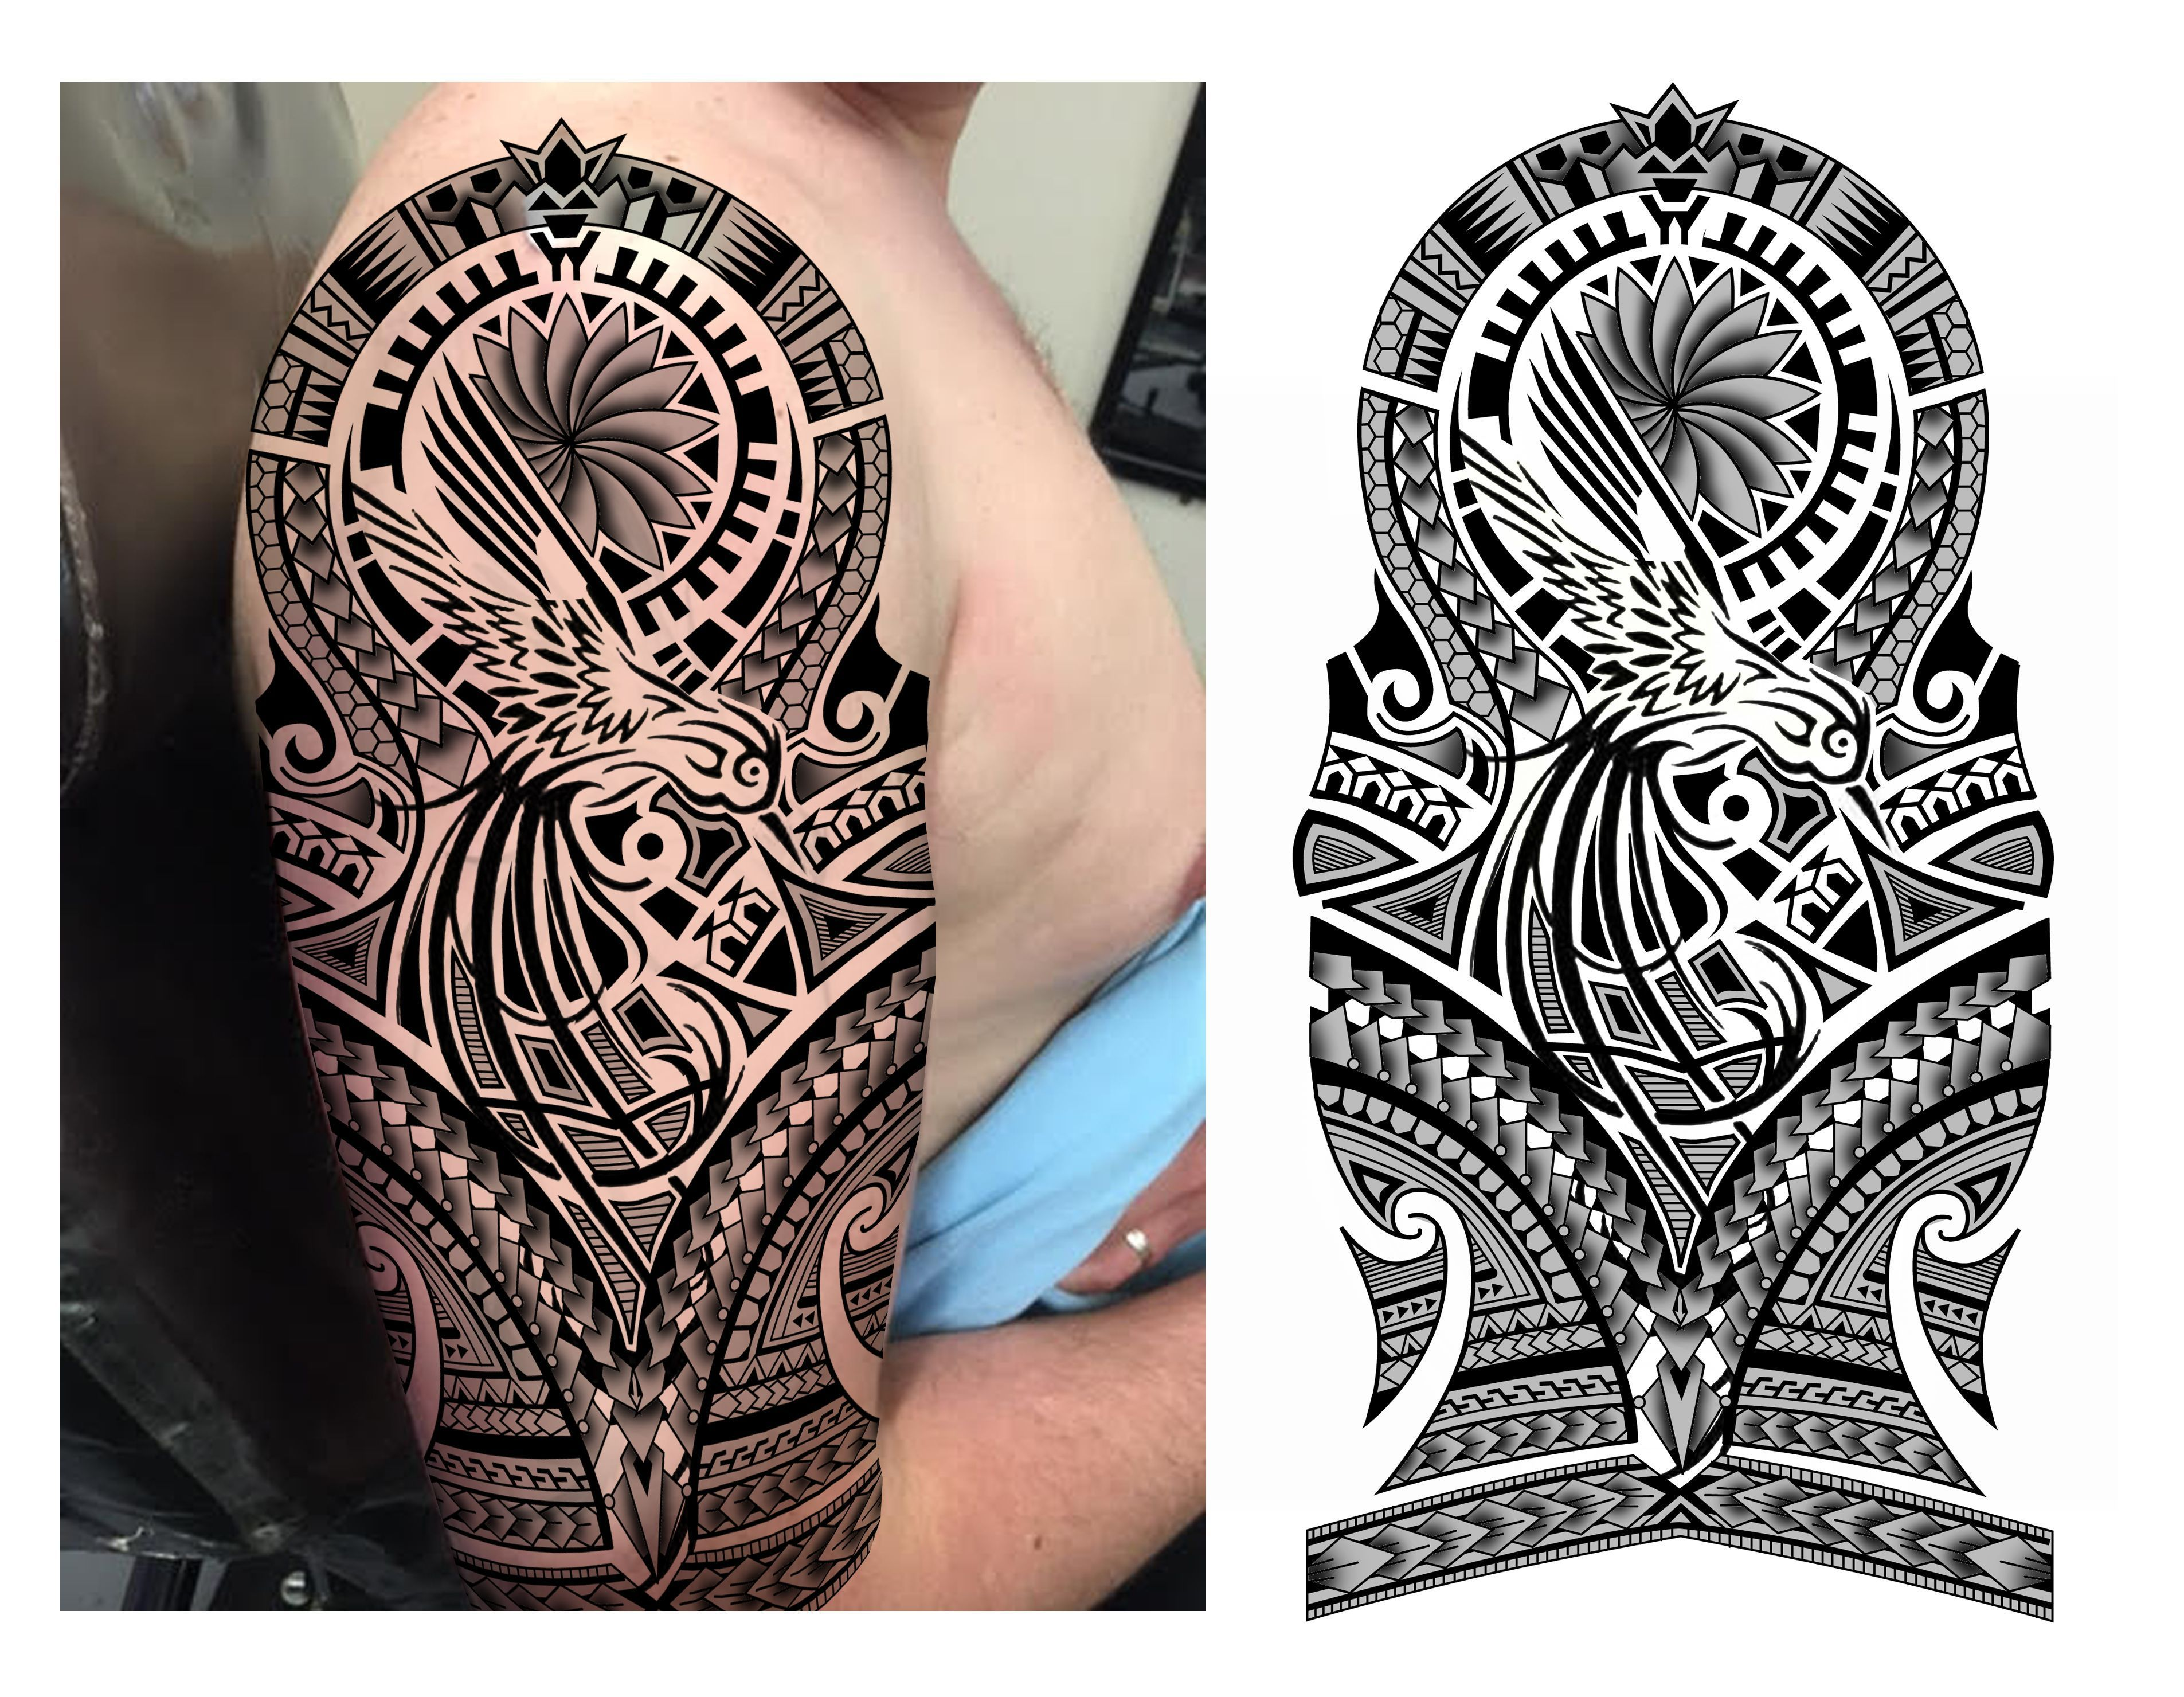 Hummingbird Maori Polynesian Tribal Half Sleeve Tattoo Design Designer Andrija Protic Tribal Tattoos Sleeve Tattoos Tribal Sleeve Tattoos